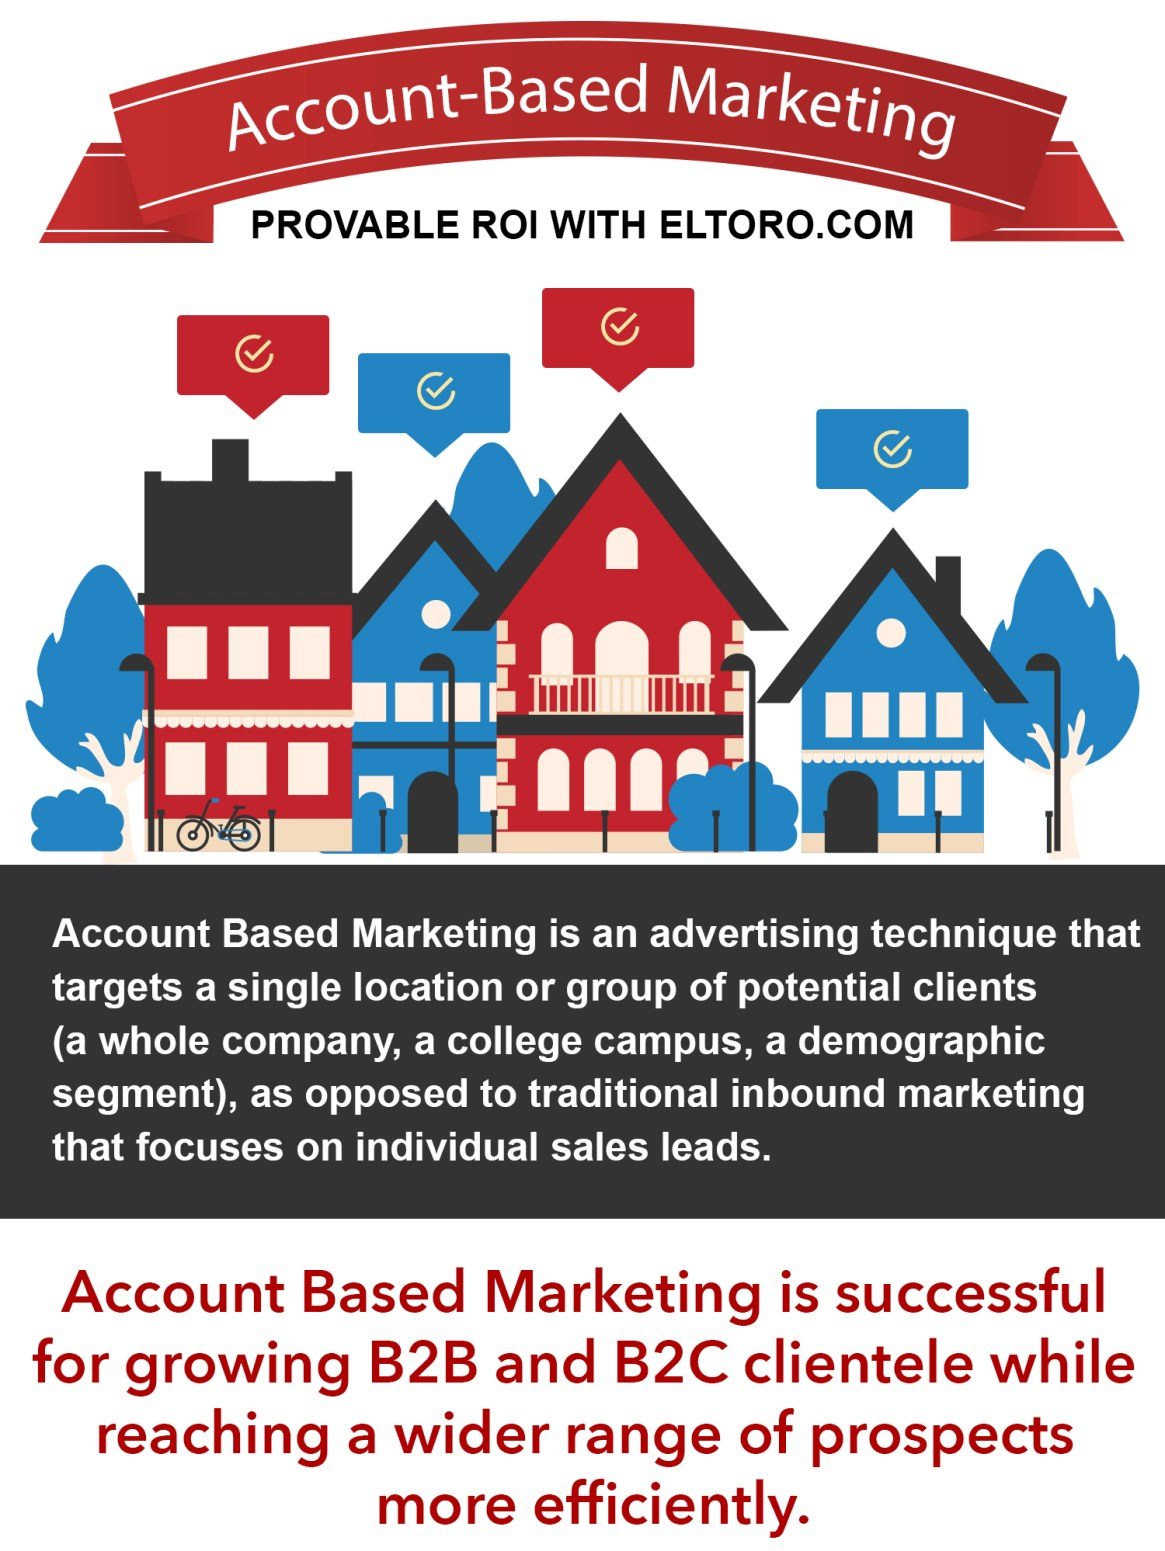 ElToro.com – Account Based Marketing